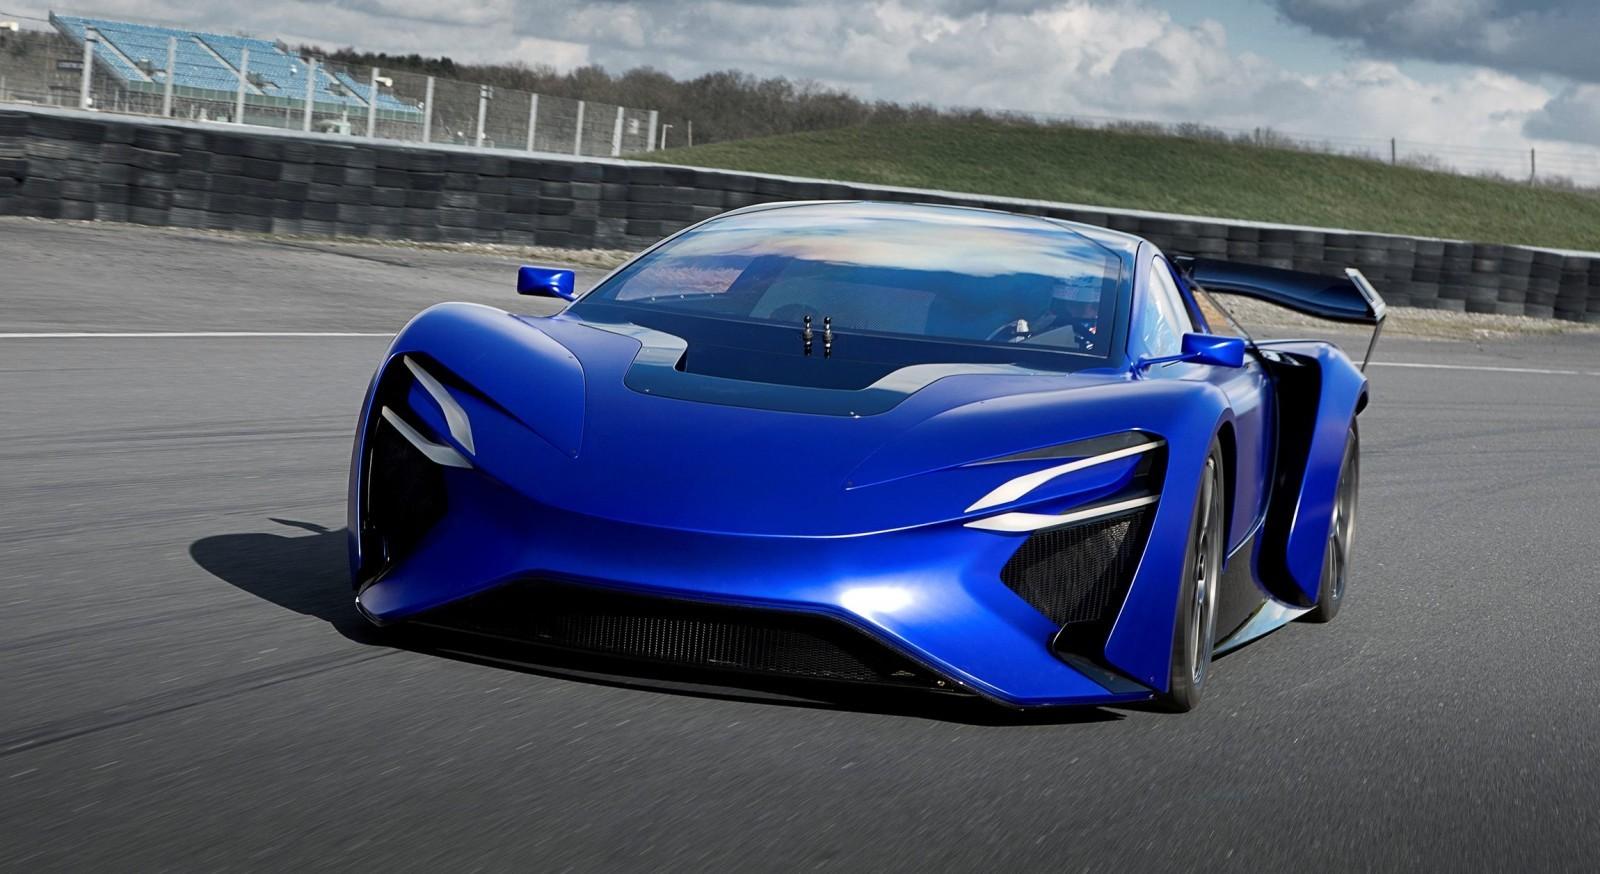 2016 techrules at96 trev supercar concept car revs for Concept car 2016